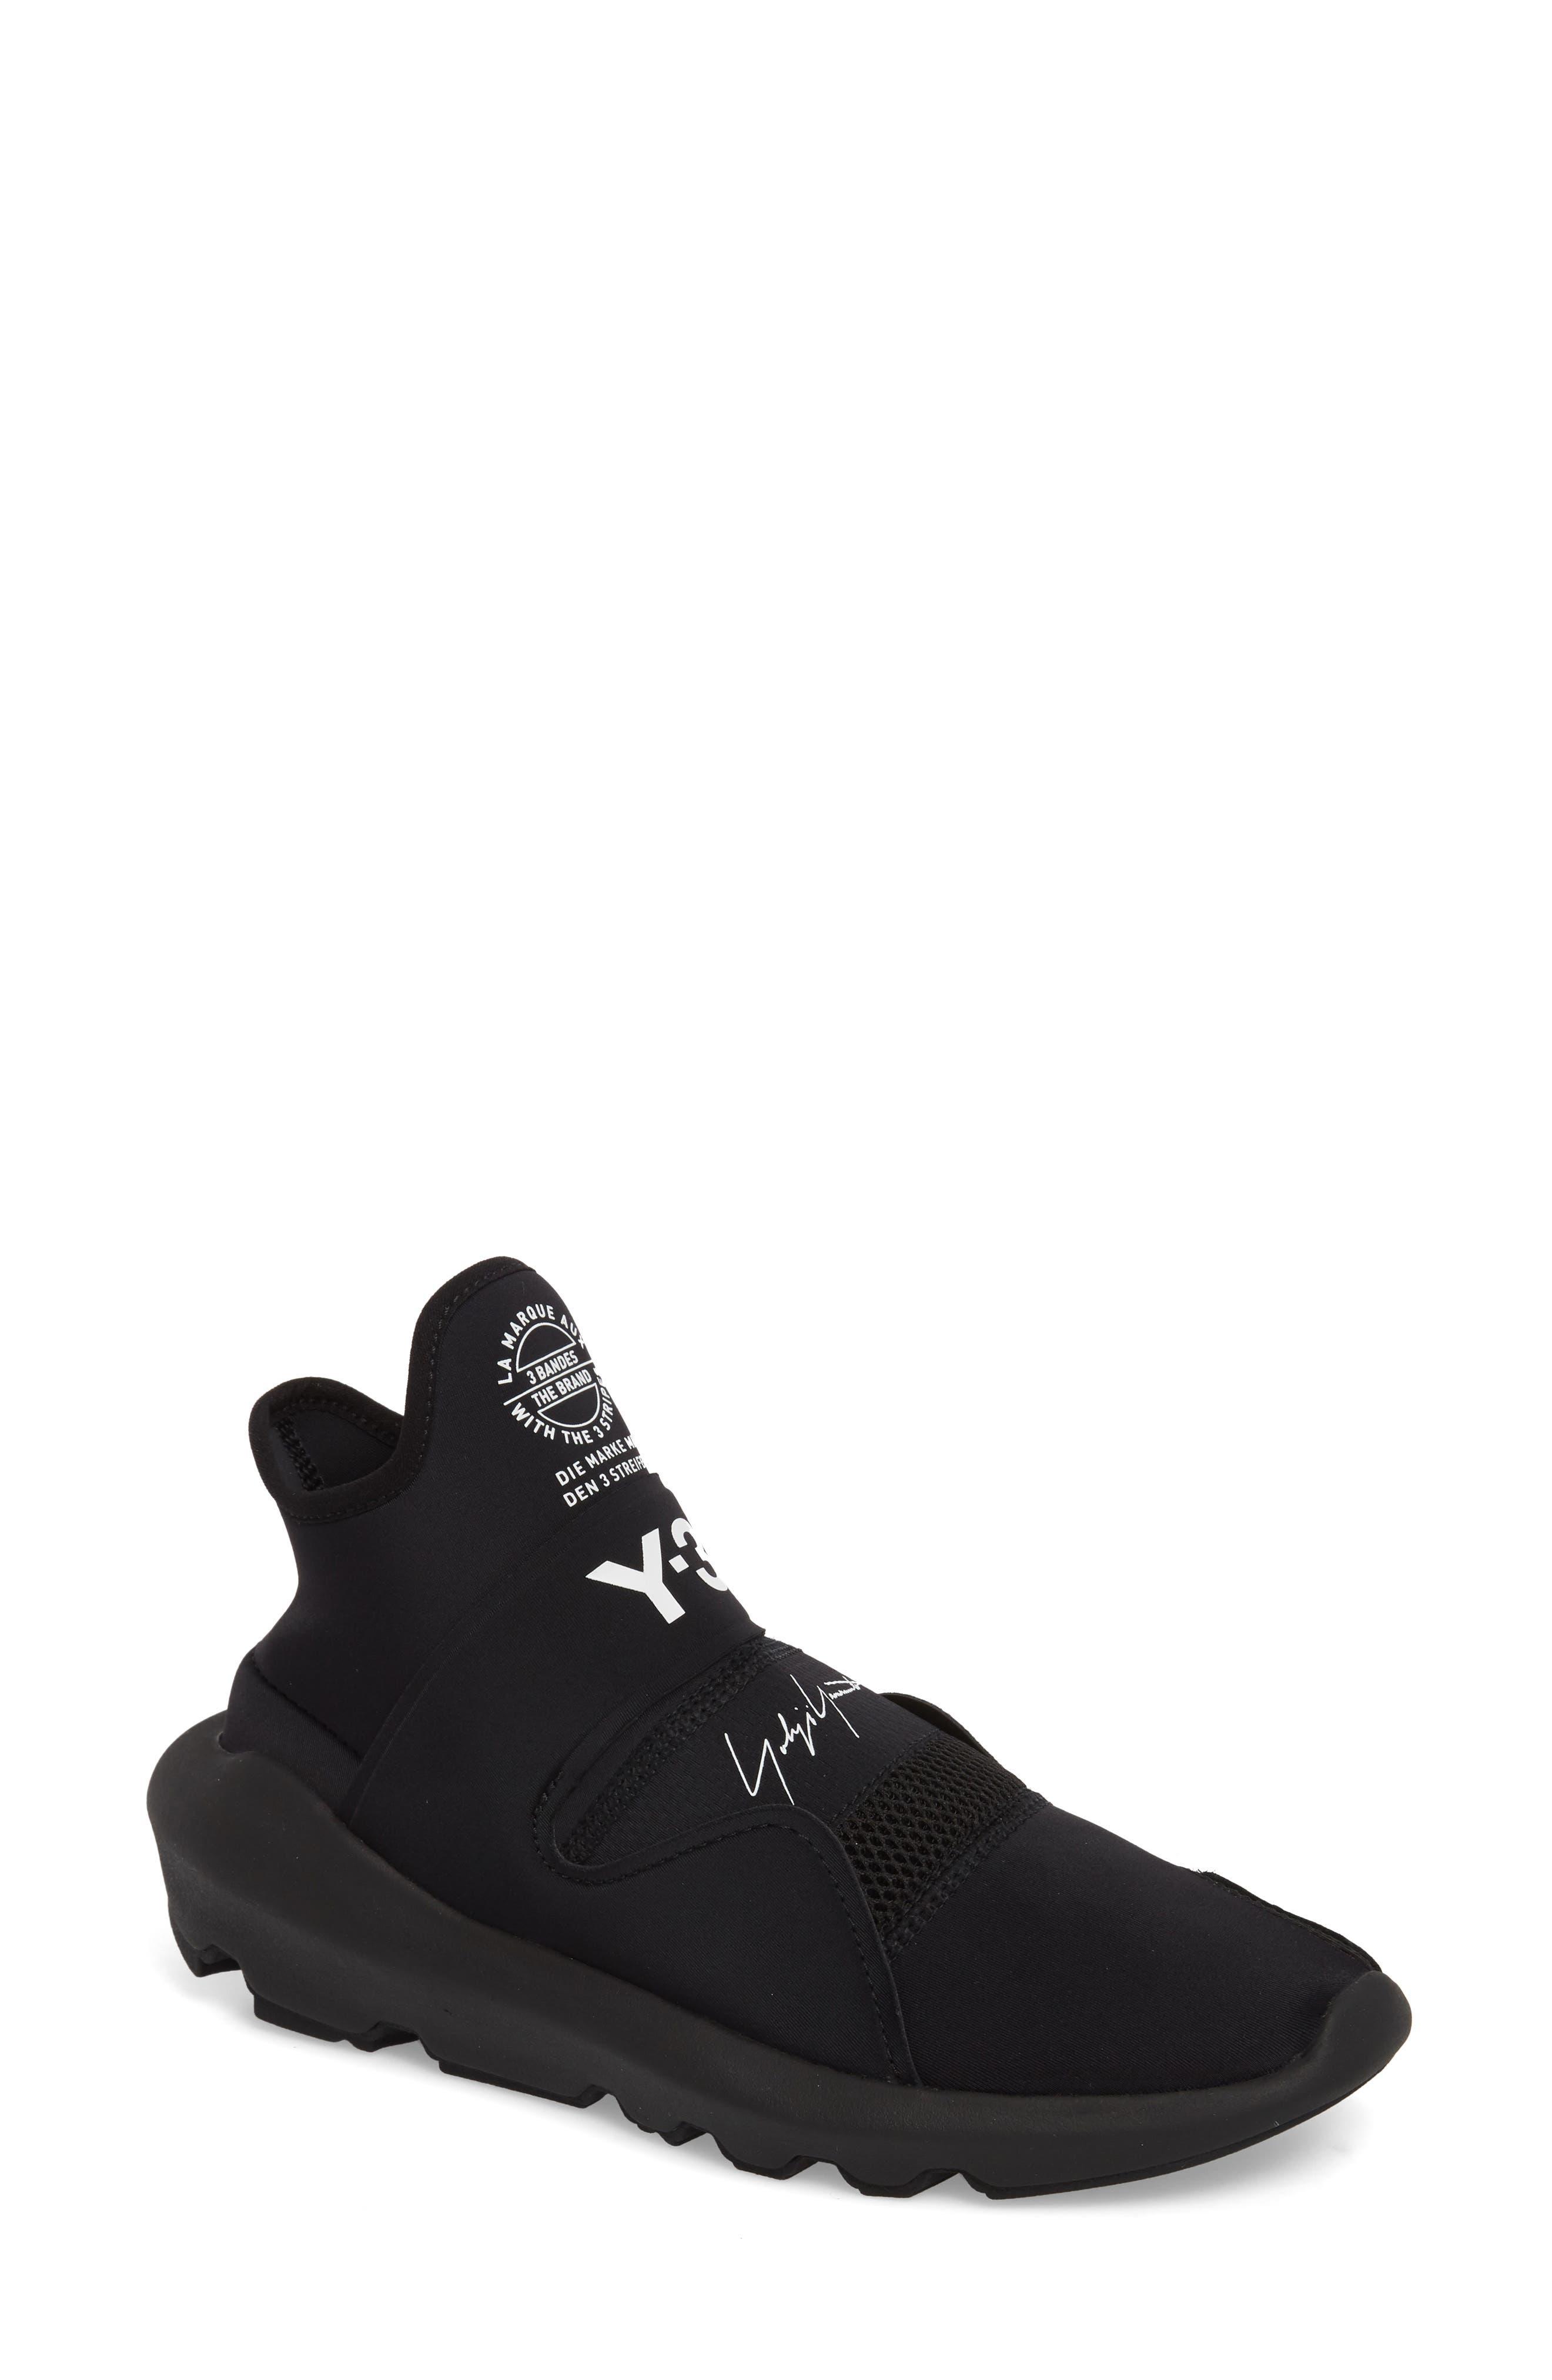 Superbou Sneaker,                             Main thumbnail 2, color,